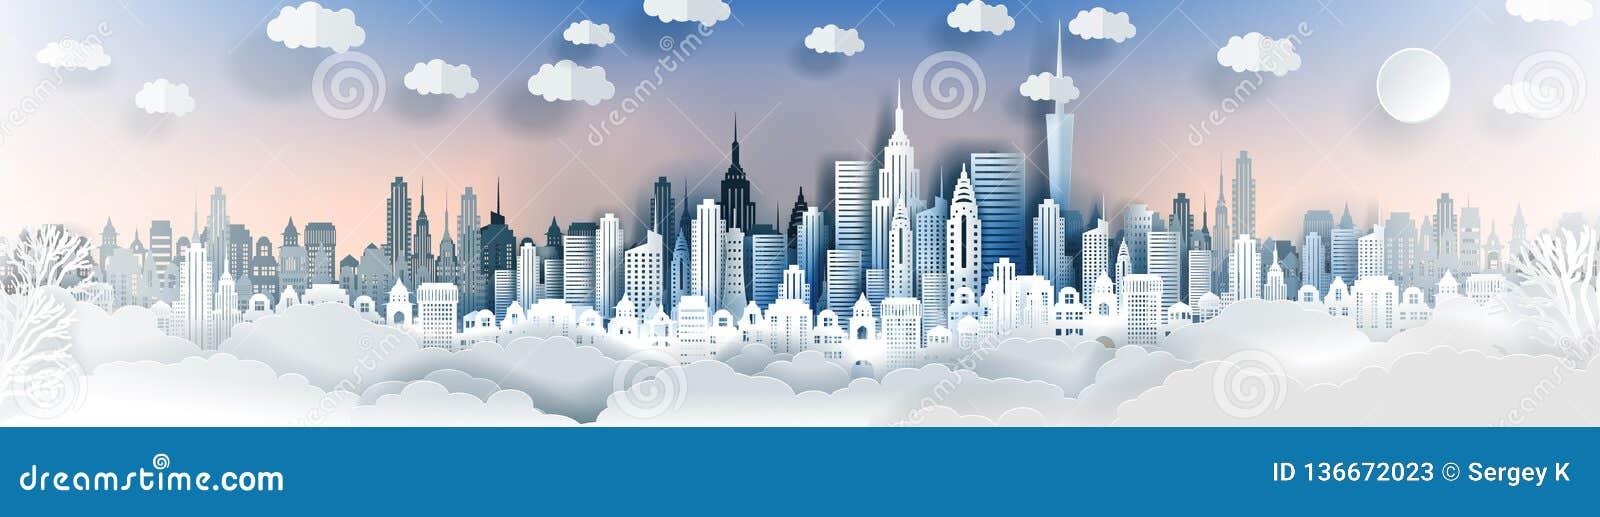 City landscape template. Paper city landscape. Downtown landscape with high skyscrapers.